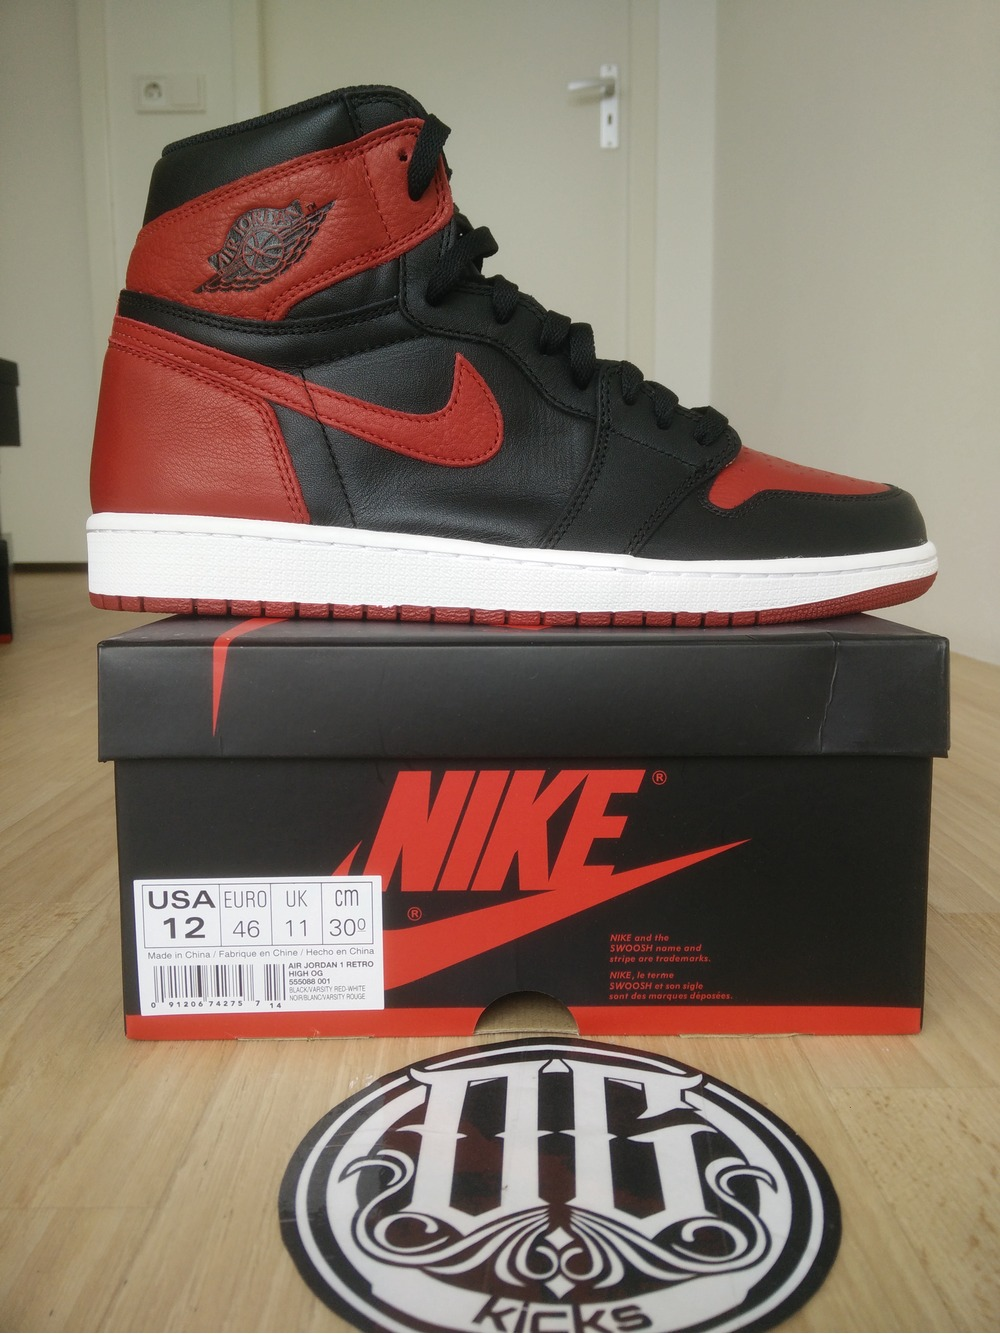 Nike Air Jordan 1 Taille 12 ordre de jeu Peu coûteux fHtF3WB